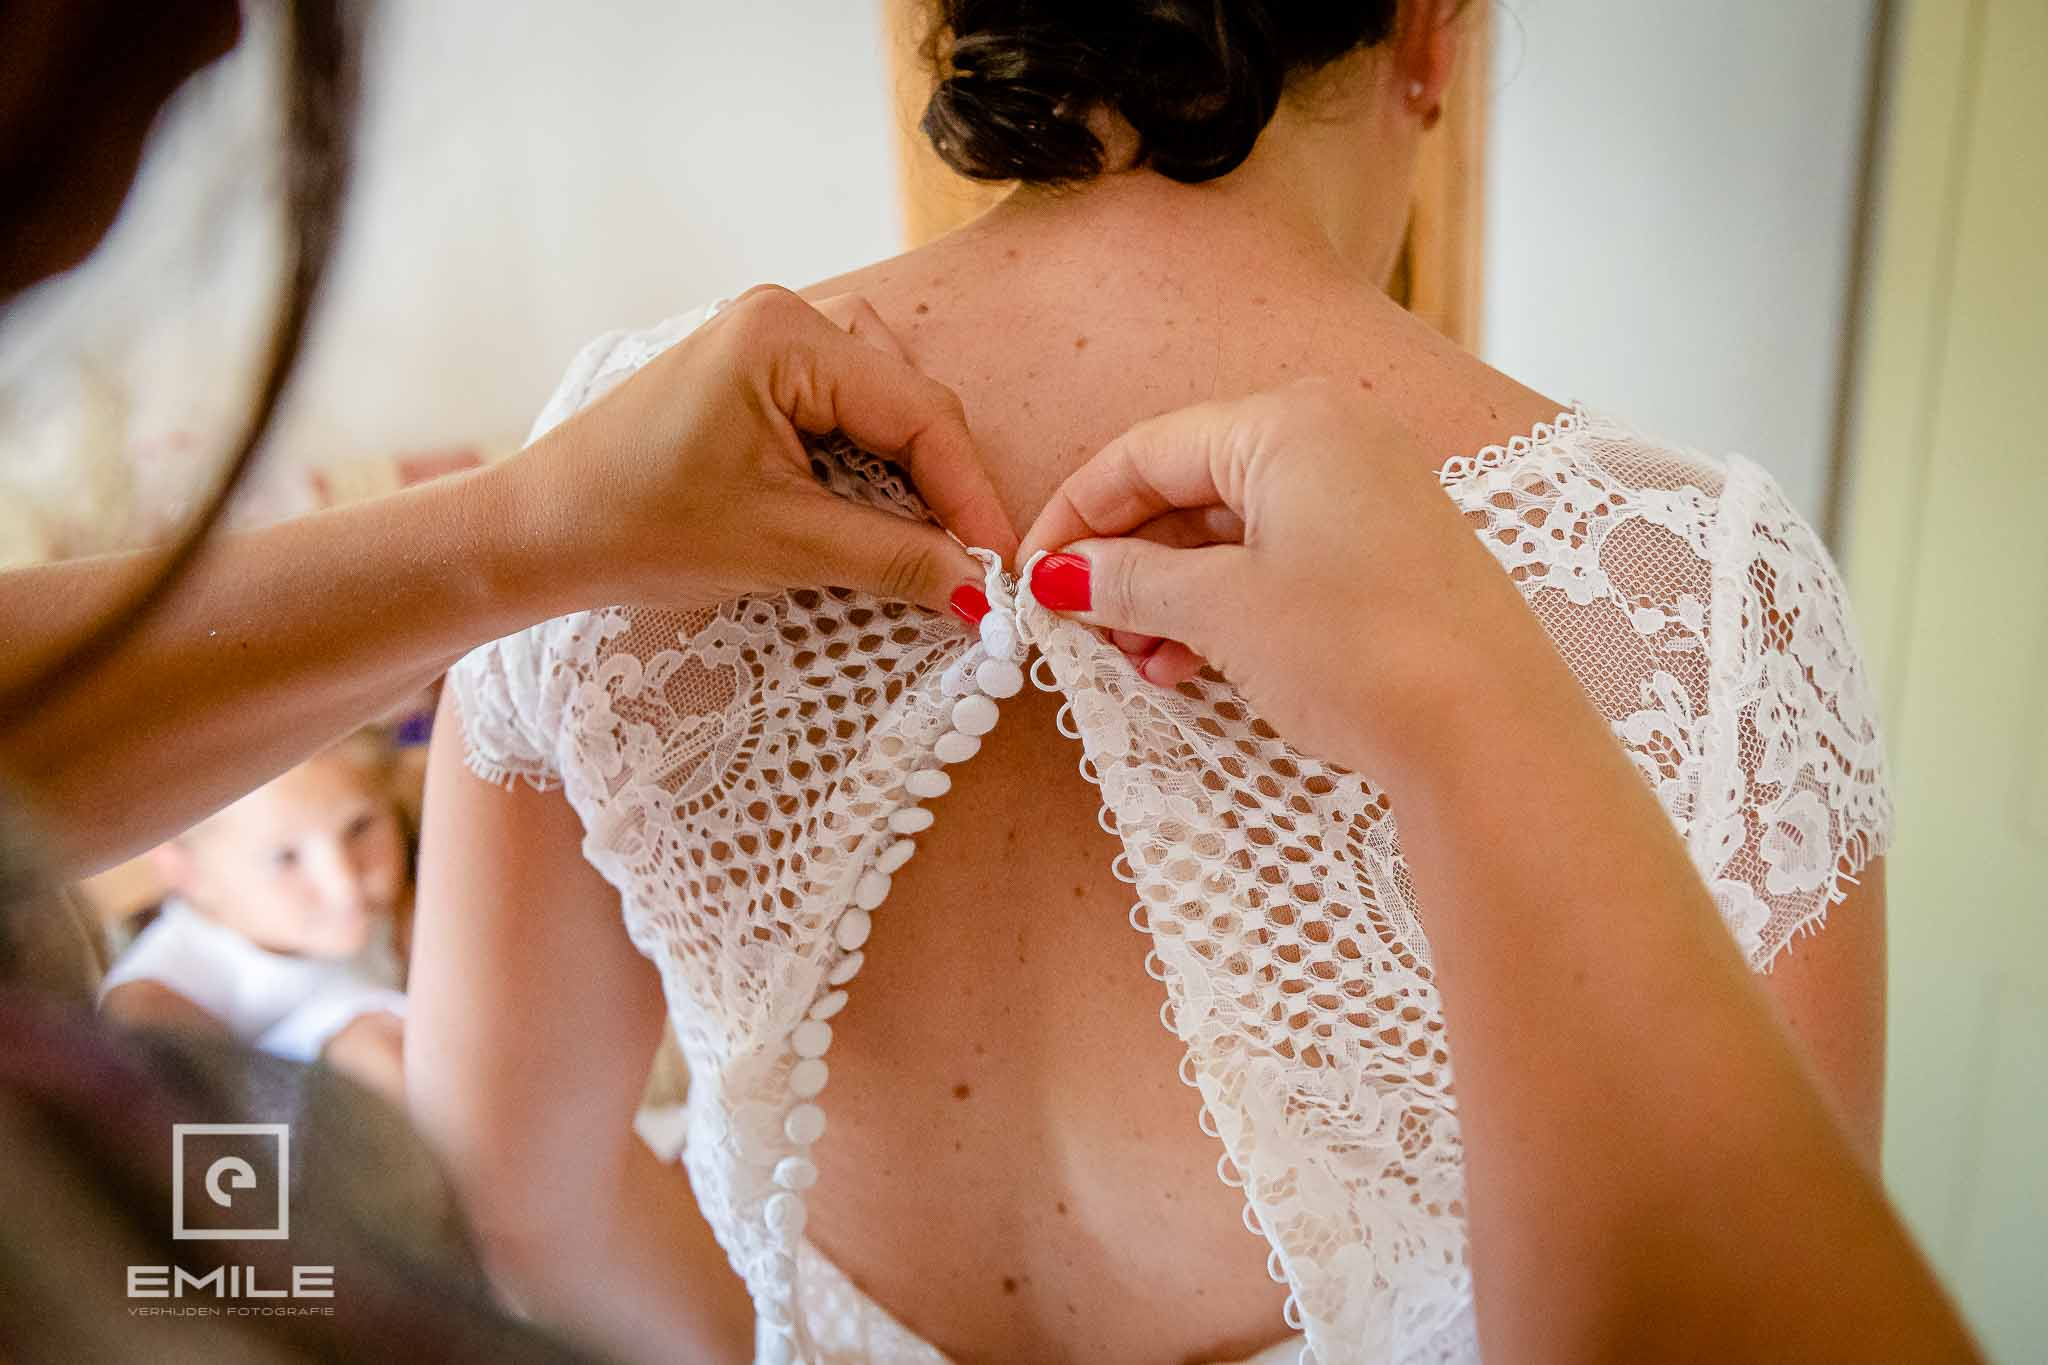 De bruidsjurk wordt dicht gemaakt - Destination wedding San Gimignano - Toscane Italie - Iris en Job